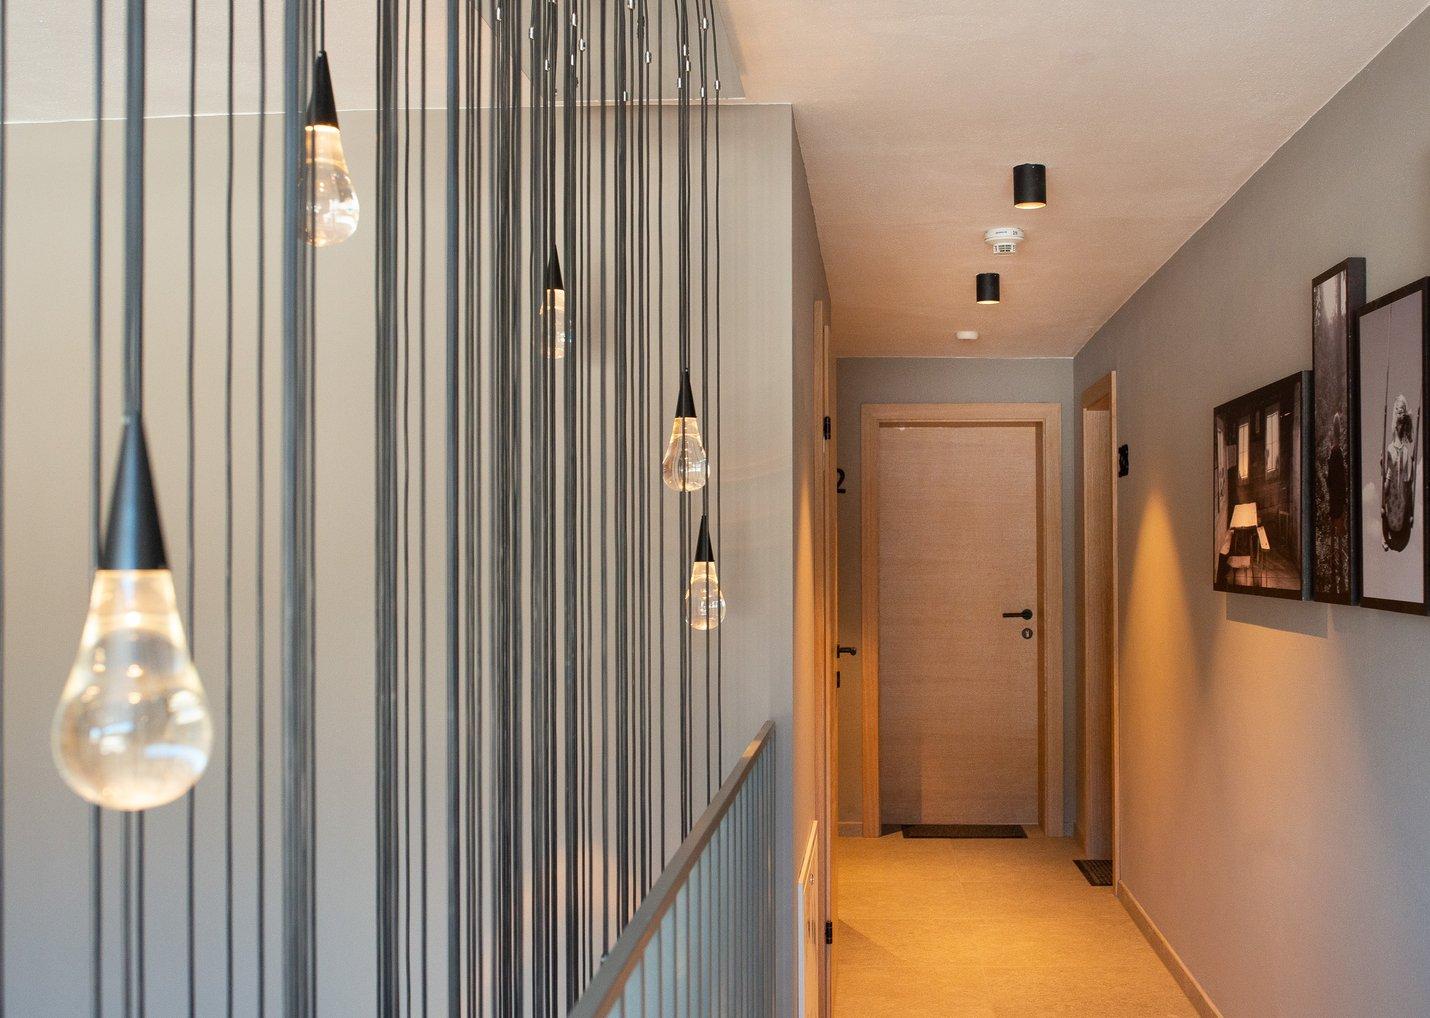 Harmls_aparthotel_©Gruber_D805397_2388er